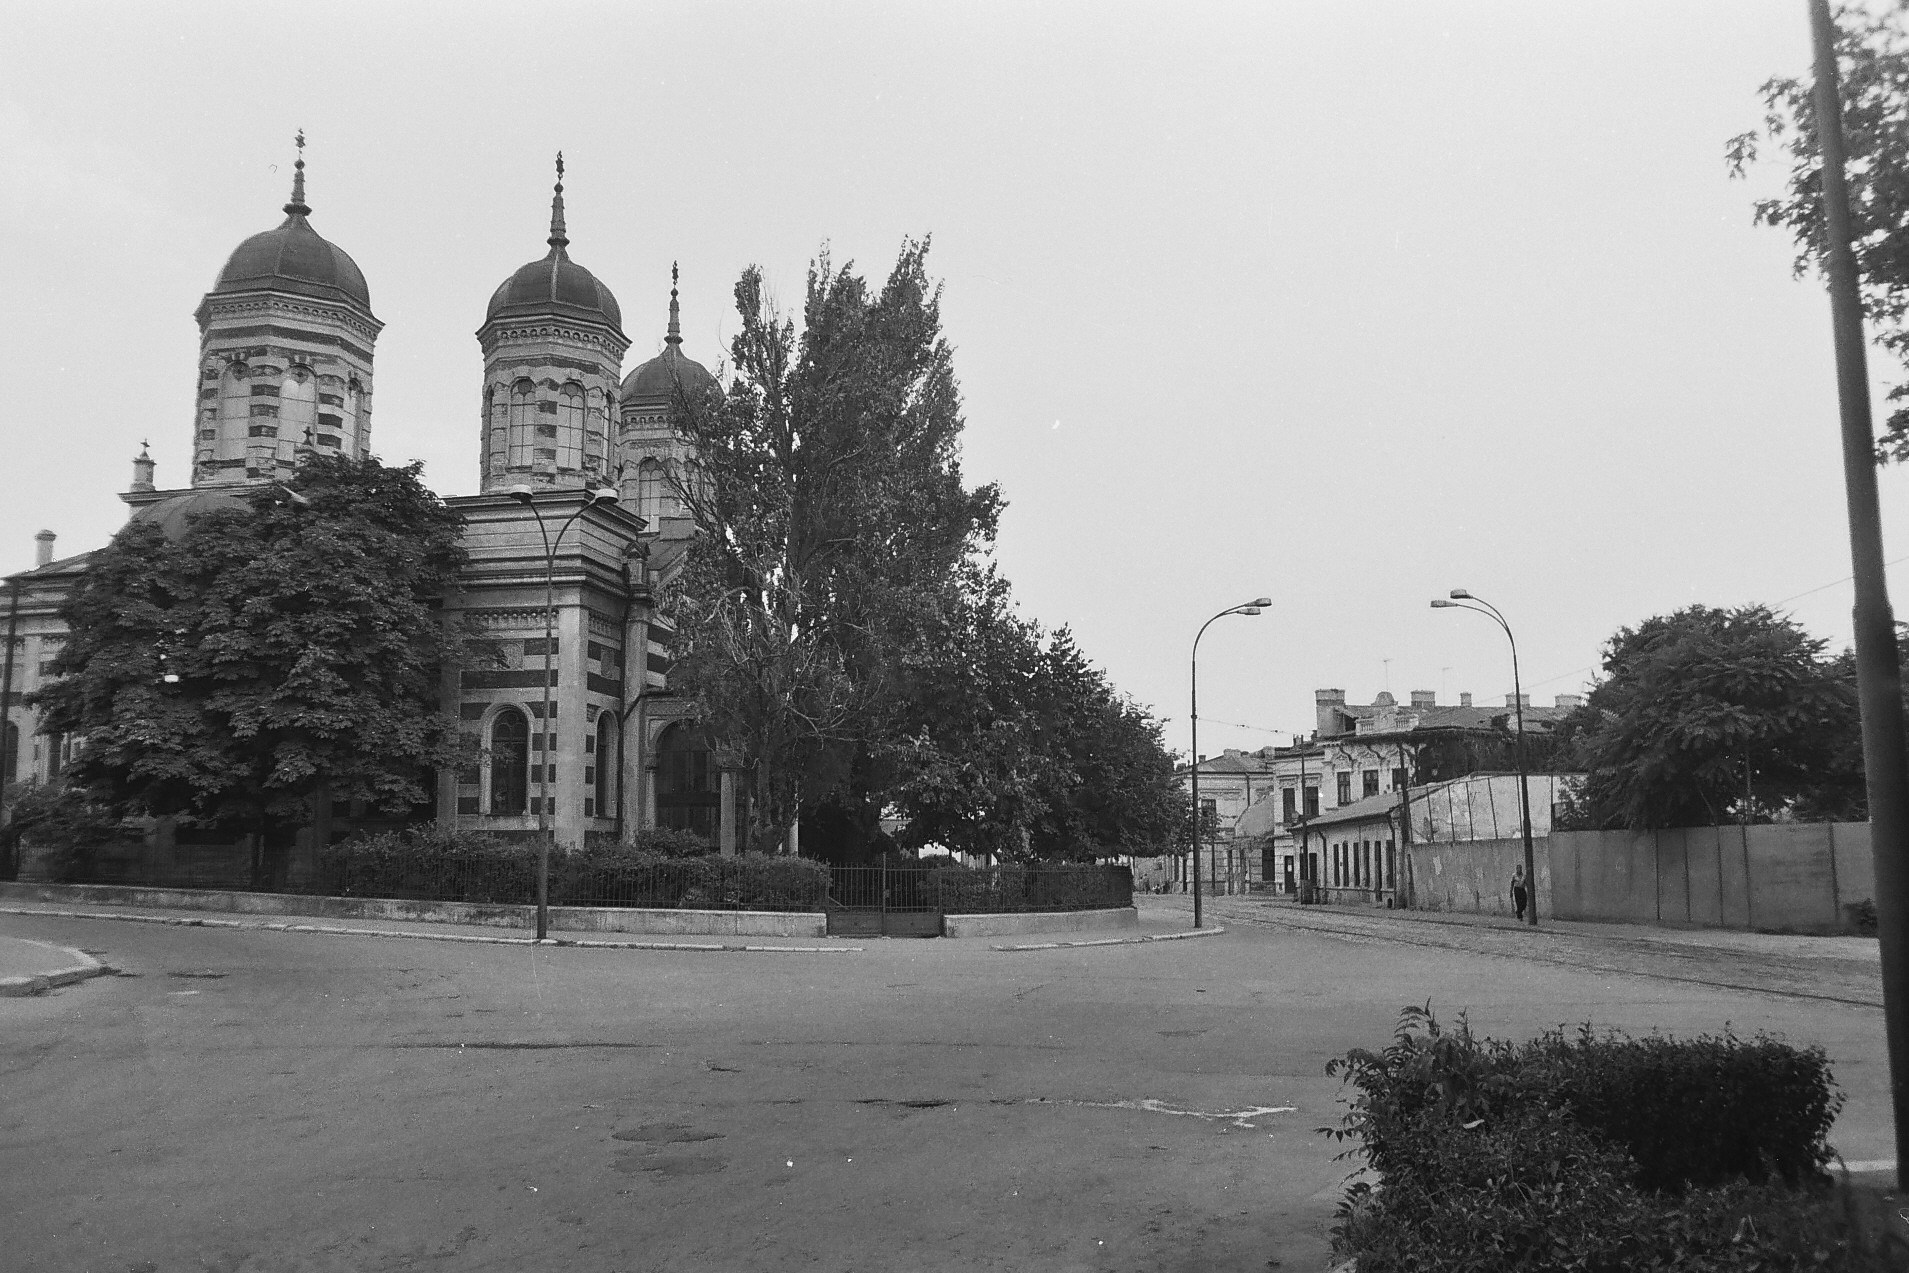 Biserica Dobroteasa - Calea Vacaresti, 1978, foto Dan Vartanian